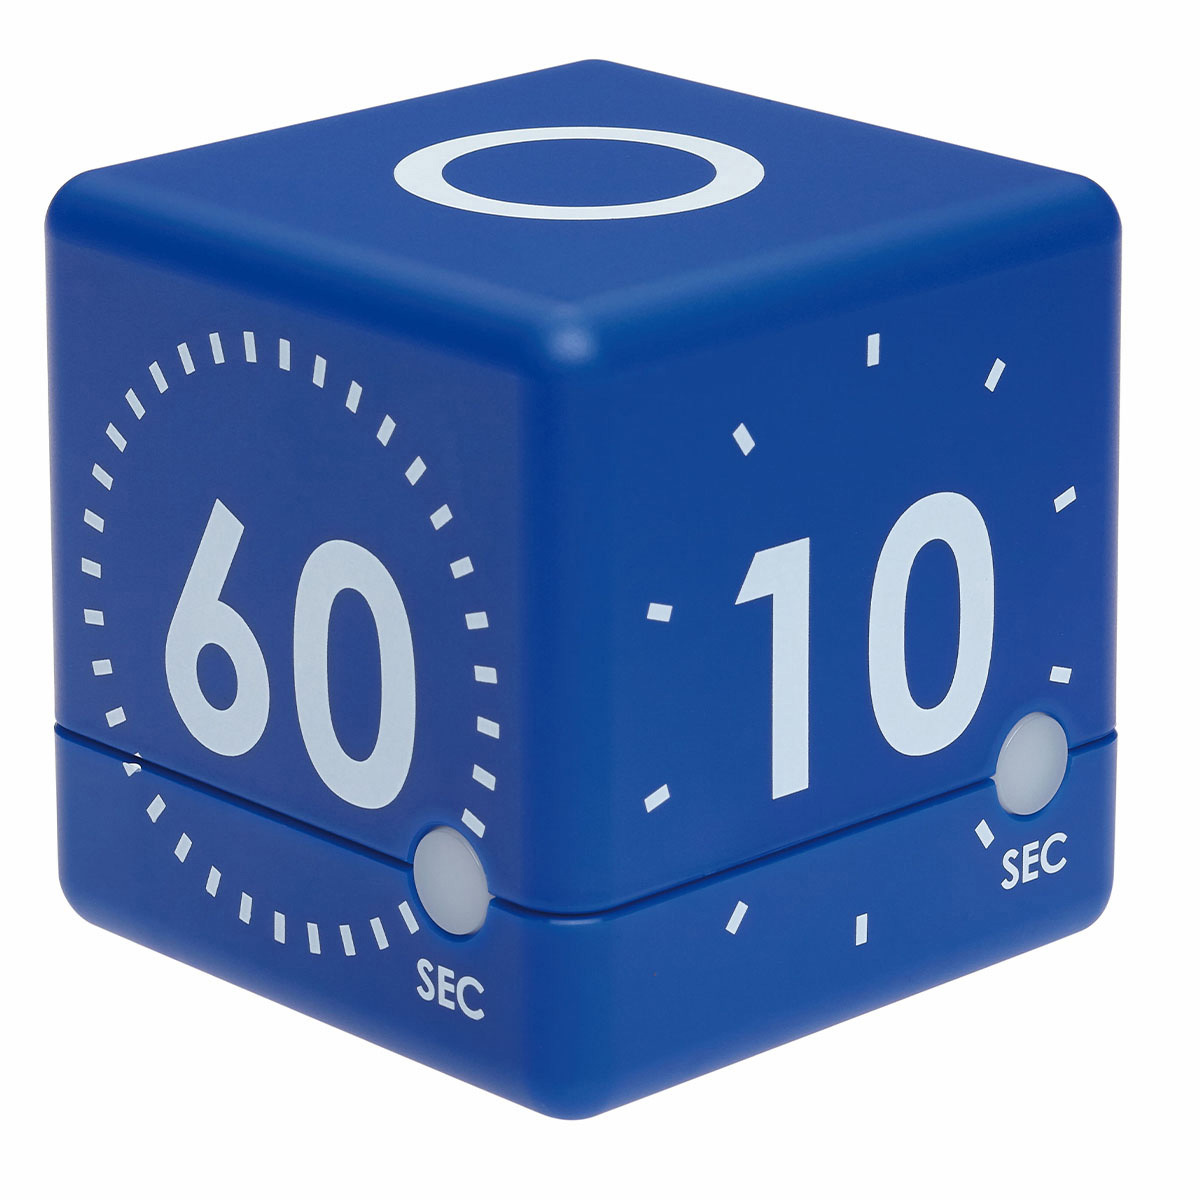 38-2036-06-digitaler-würfel-timer-cube-timer-1200x1200px.jpg